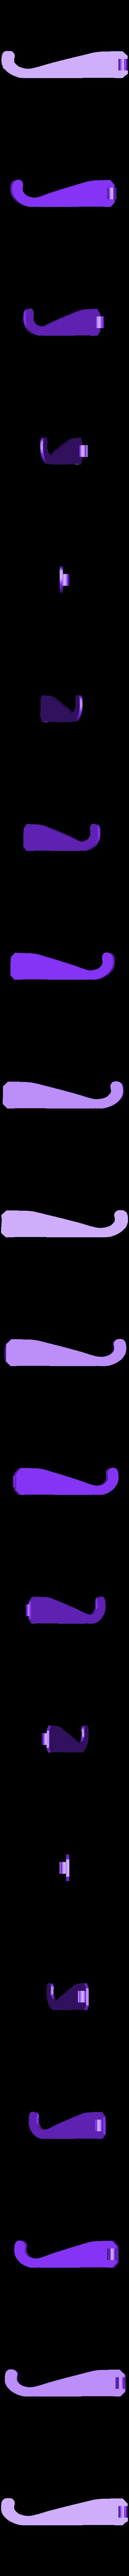 luna_lovegood_glasses_right_ear.stl Download free STL file Luna Lovegood SpectreSpecs • 3D printer template, mark579